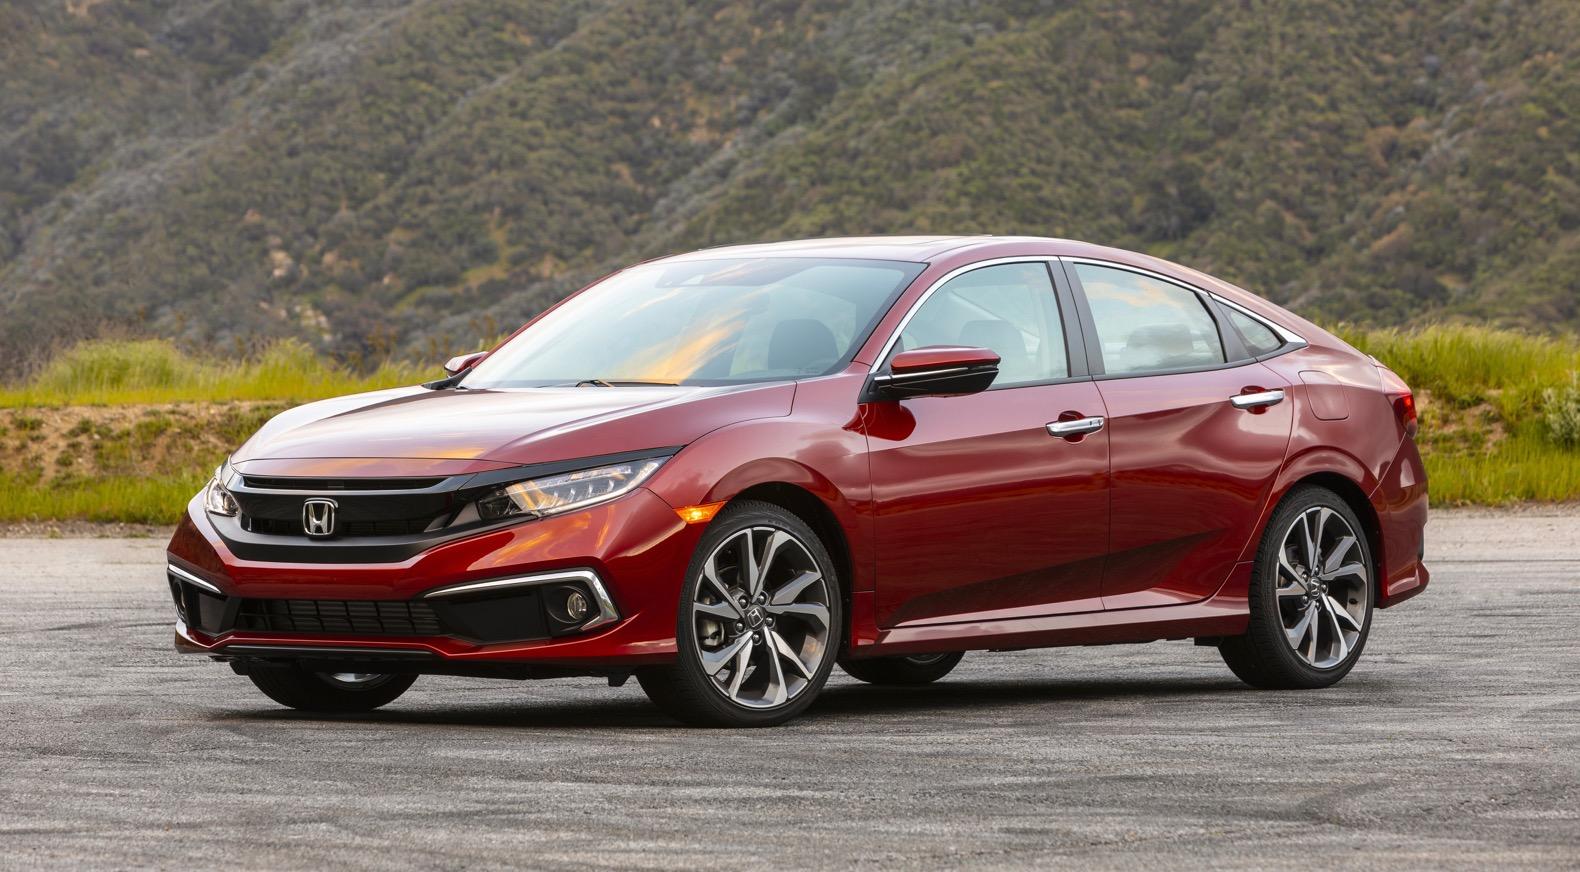 2020 Honda Civic starts at $20,680 | The Torque Report